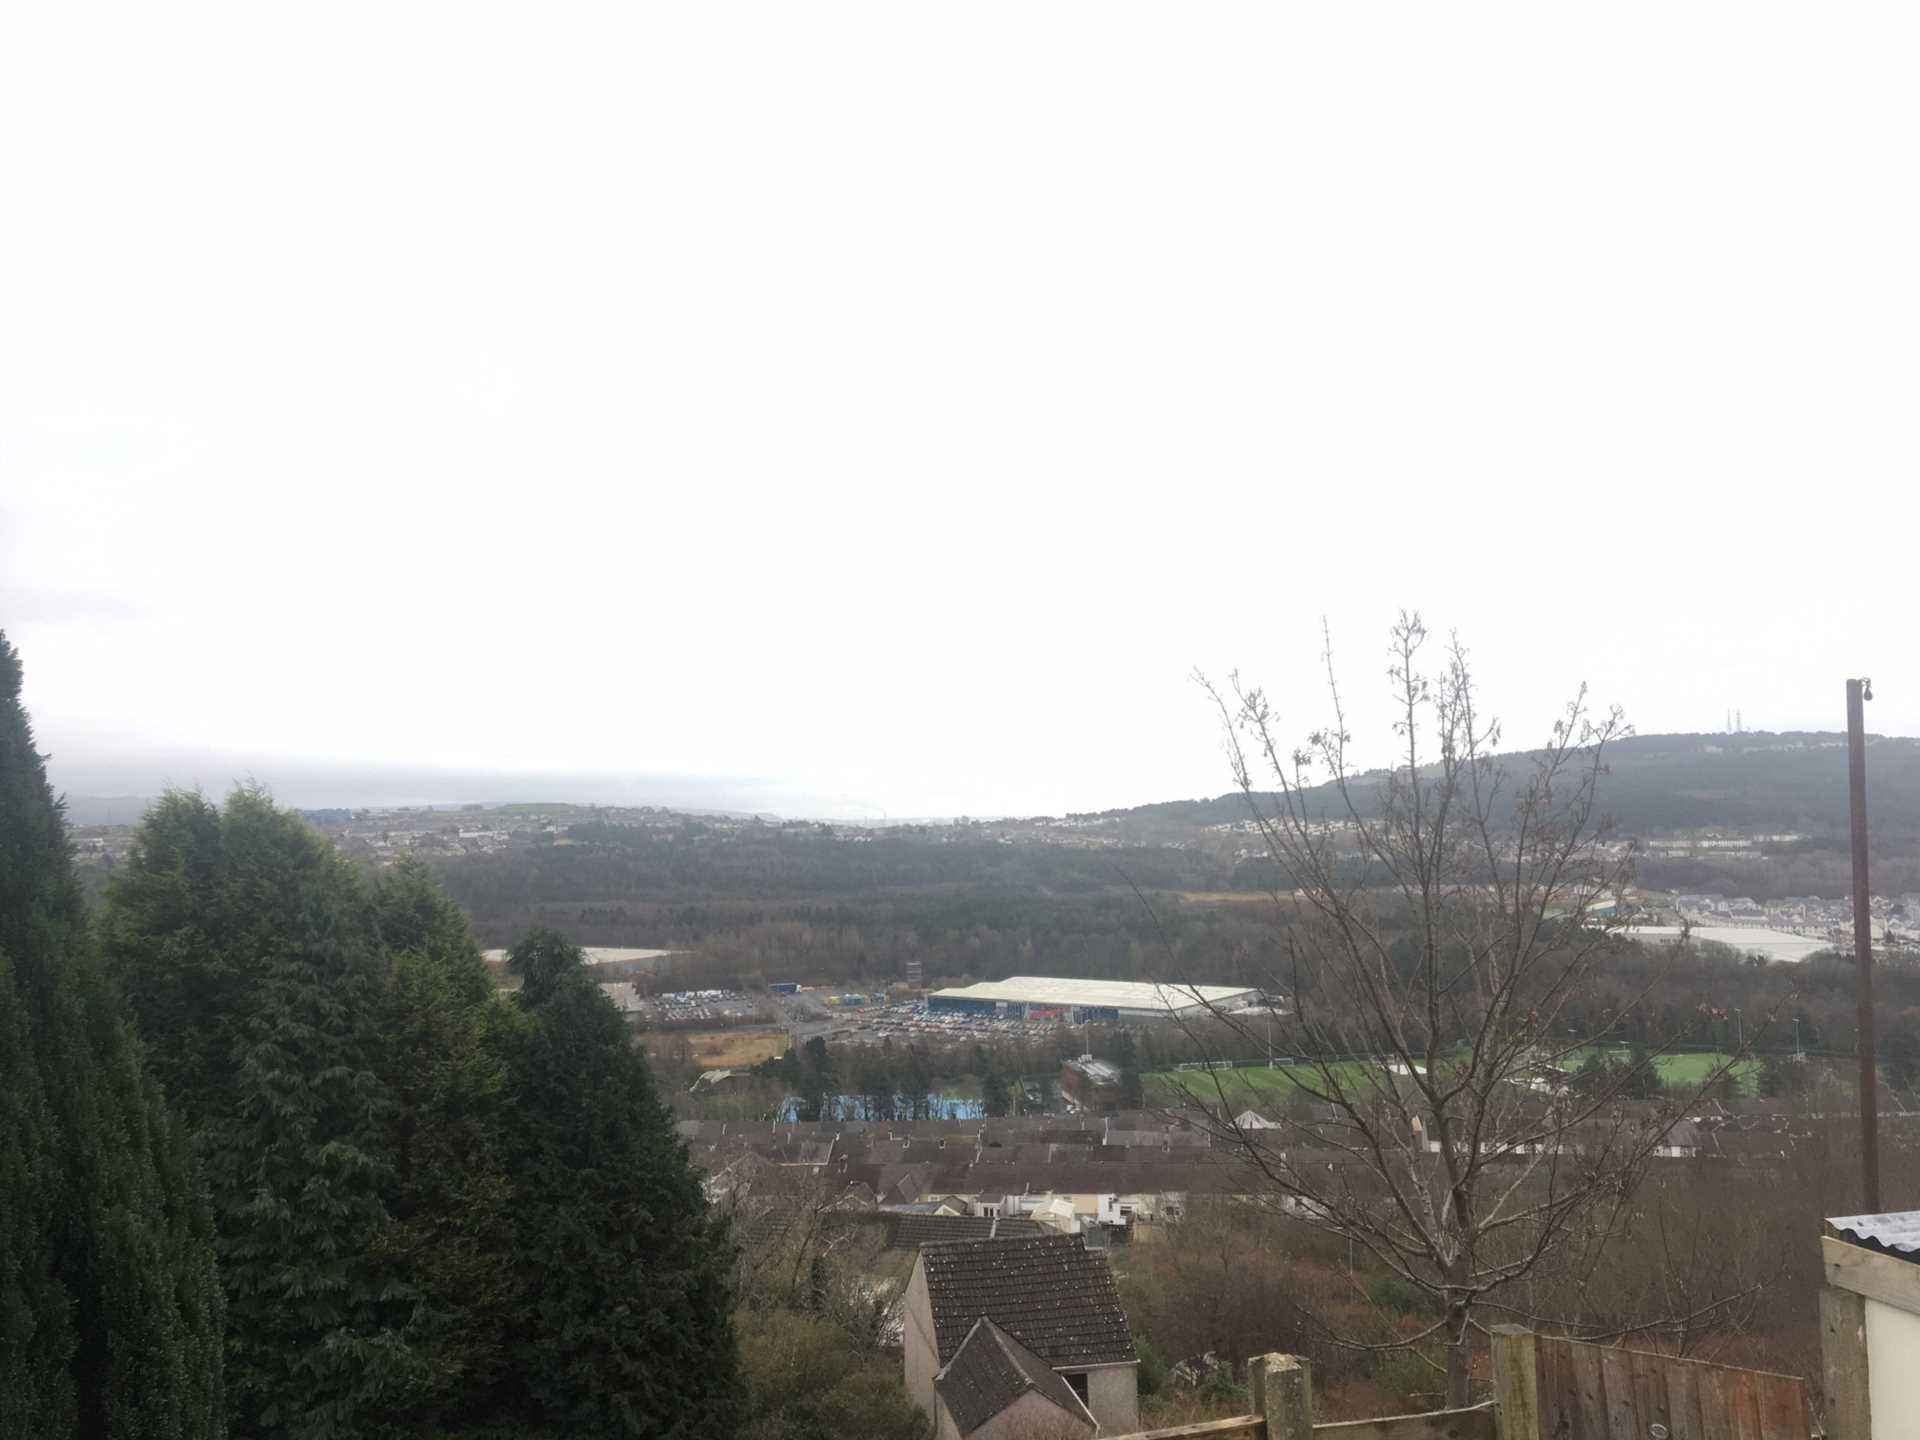 Trewyddfa Road, Morriston, Image 16